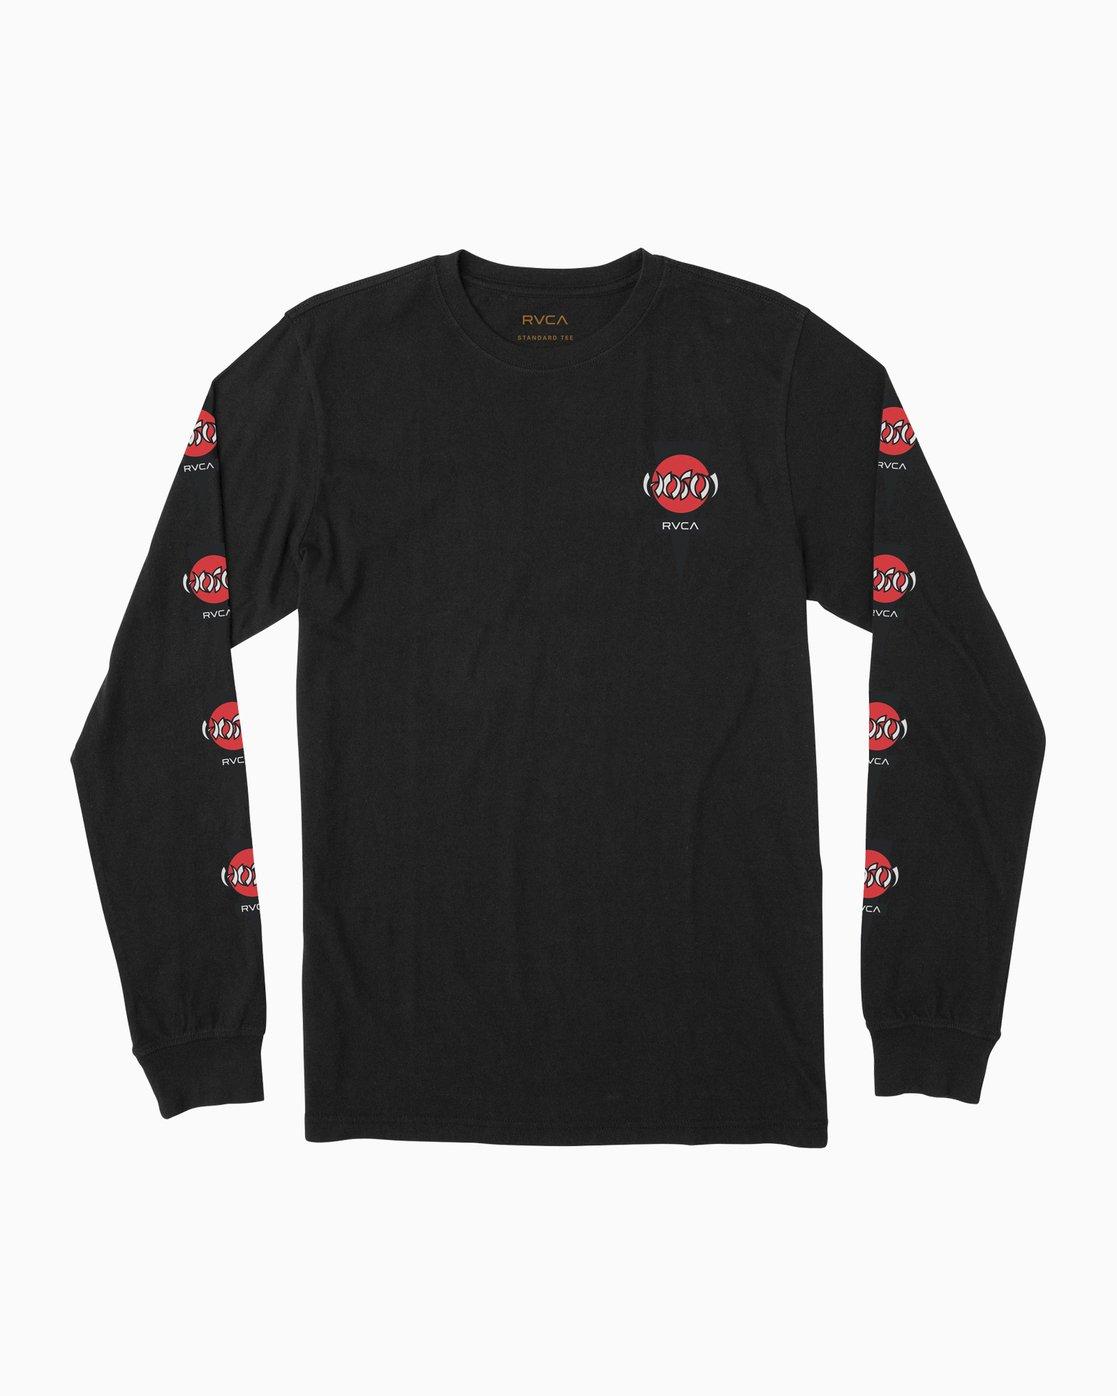 0 Christian Hosoi Long Sleeve T-Shirt Black M451SRHS RVCA